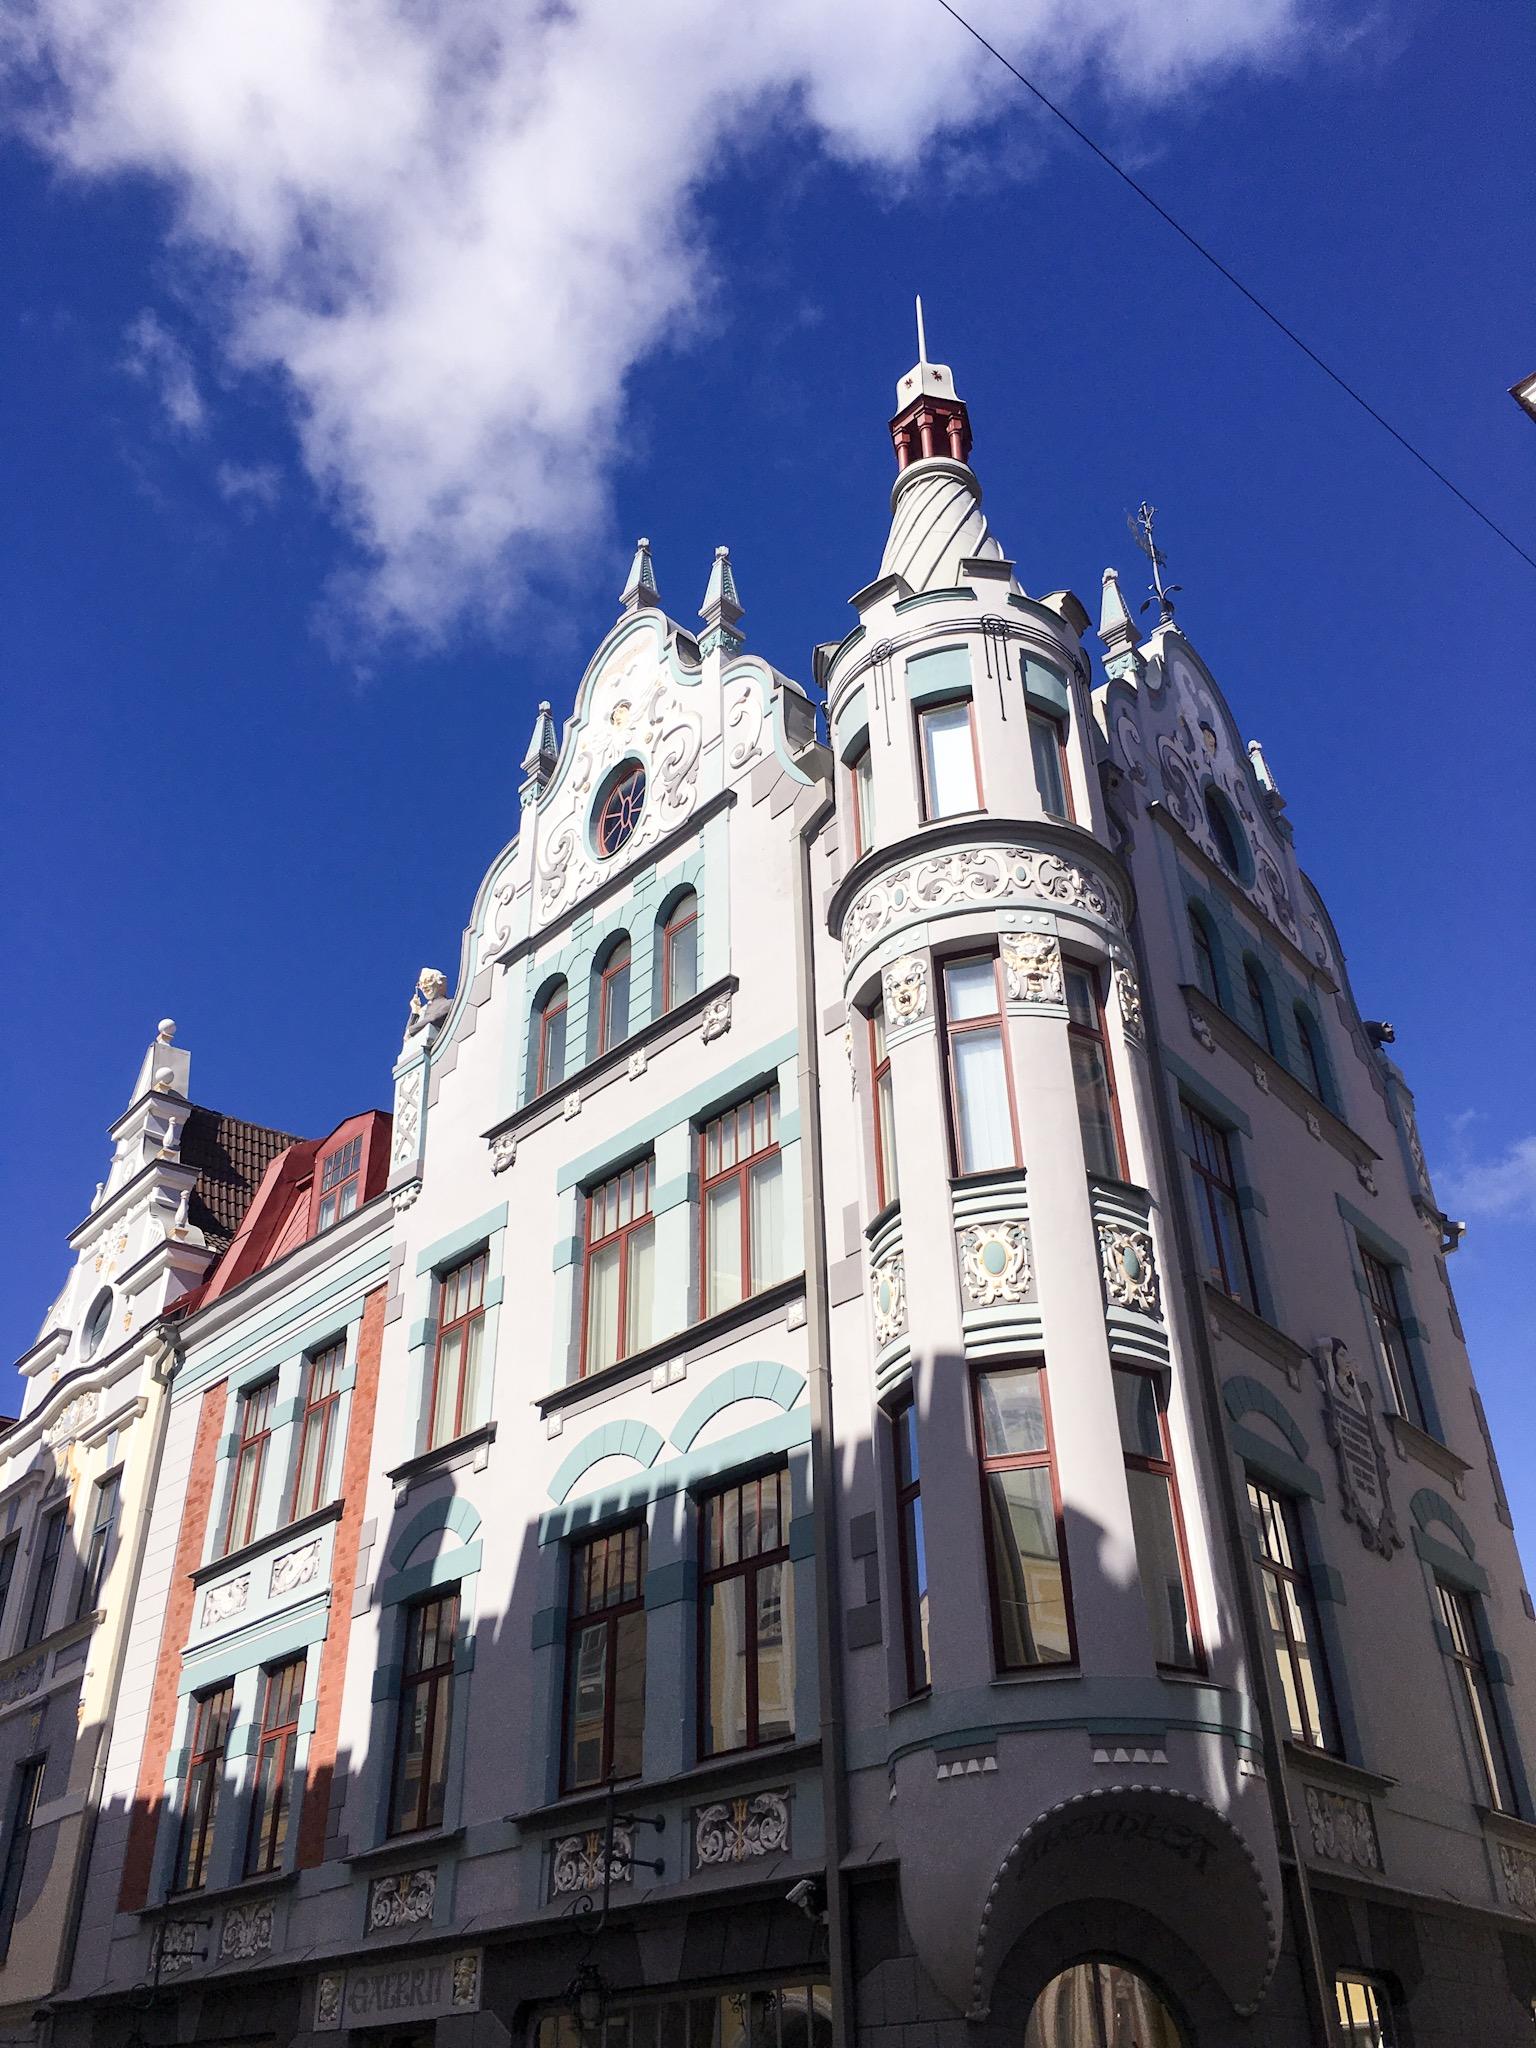 Pretty building in Tallinn, Estonia